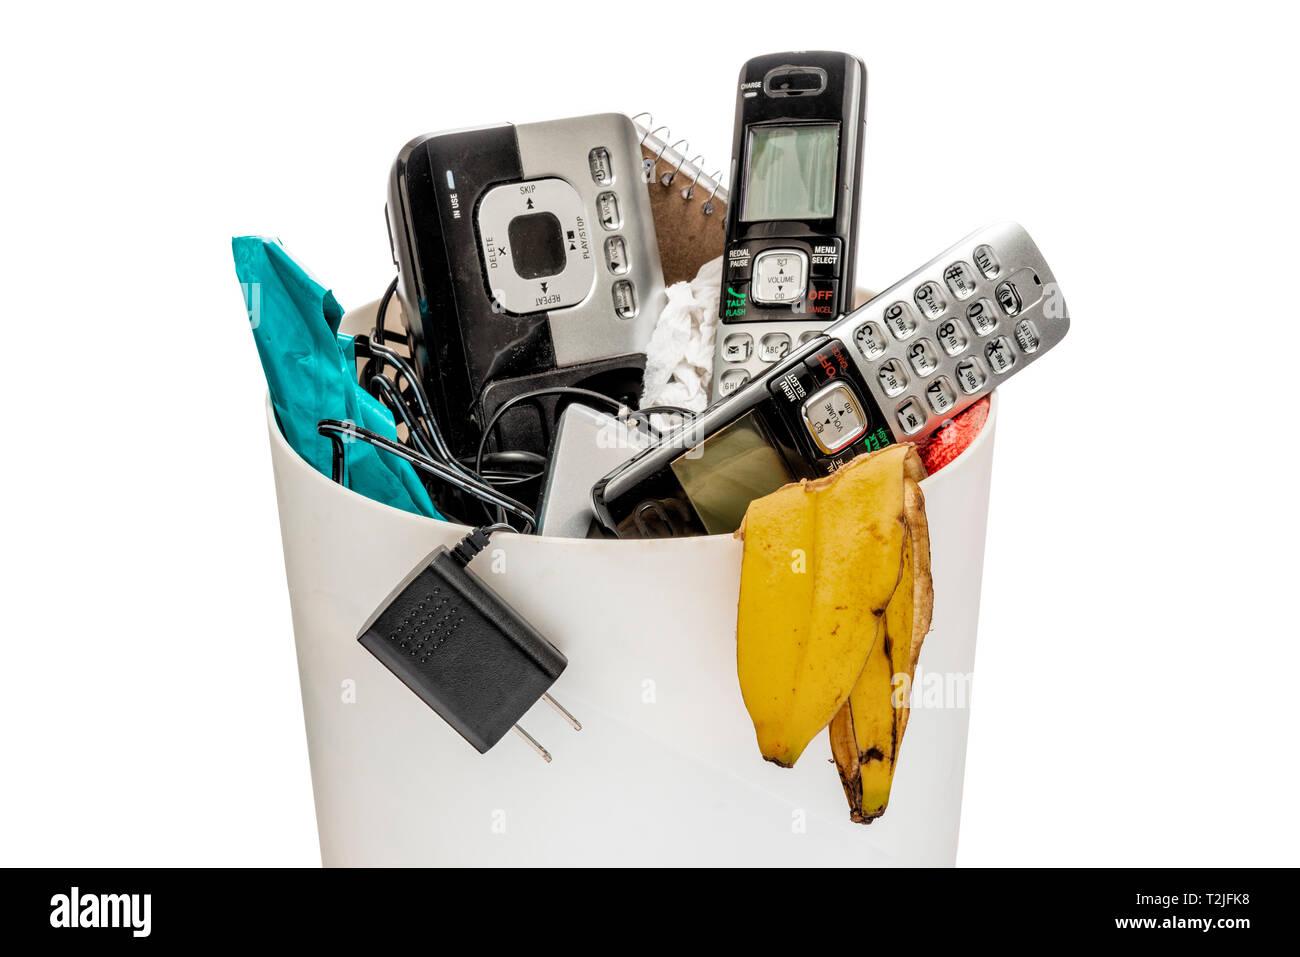 Horizontal shot of land line telephones thrown away in a trashcan. - Stock Image